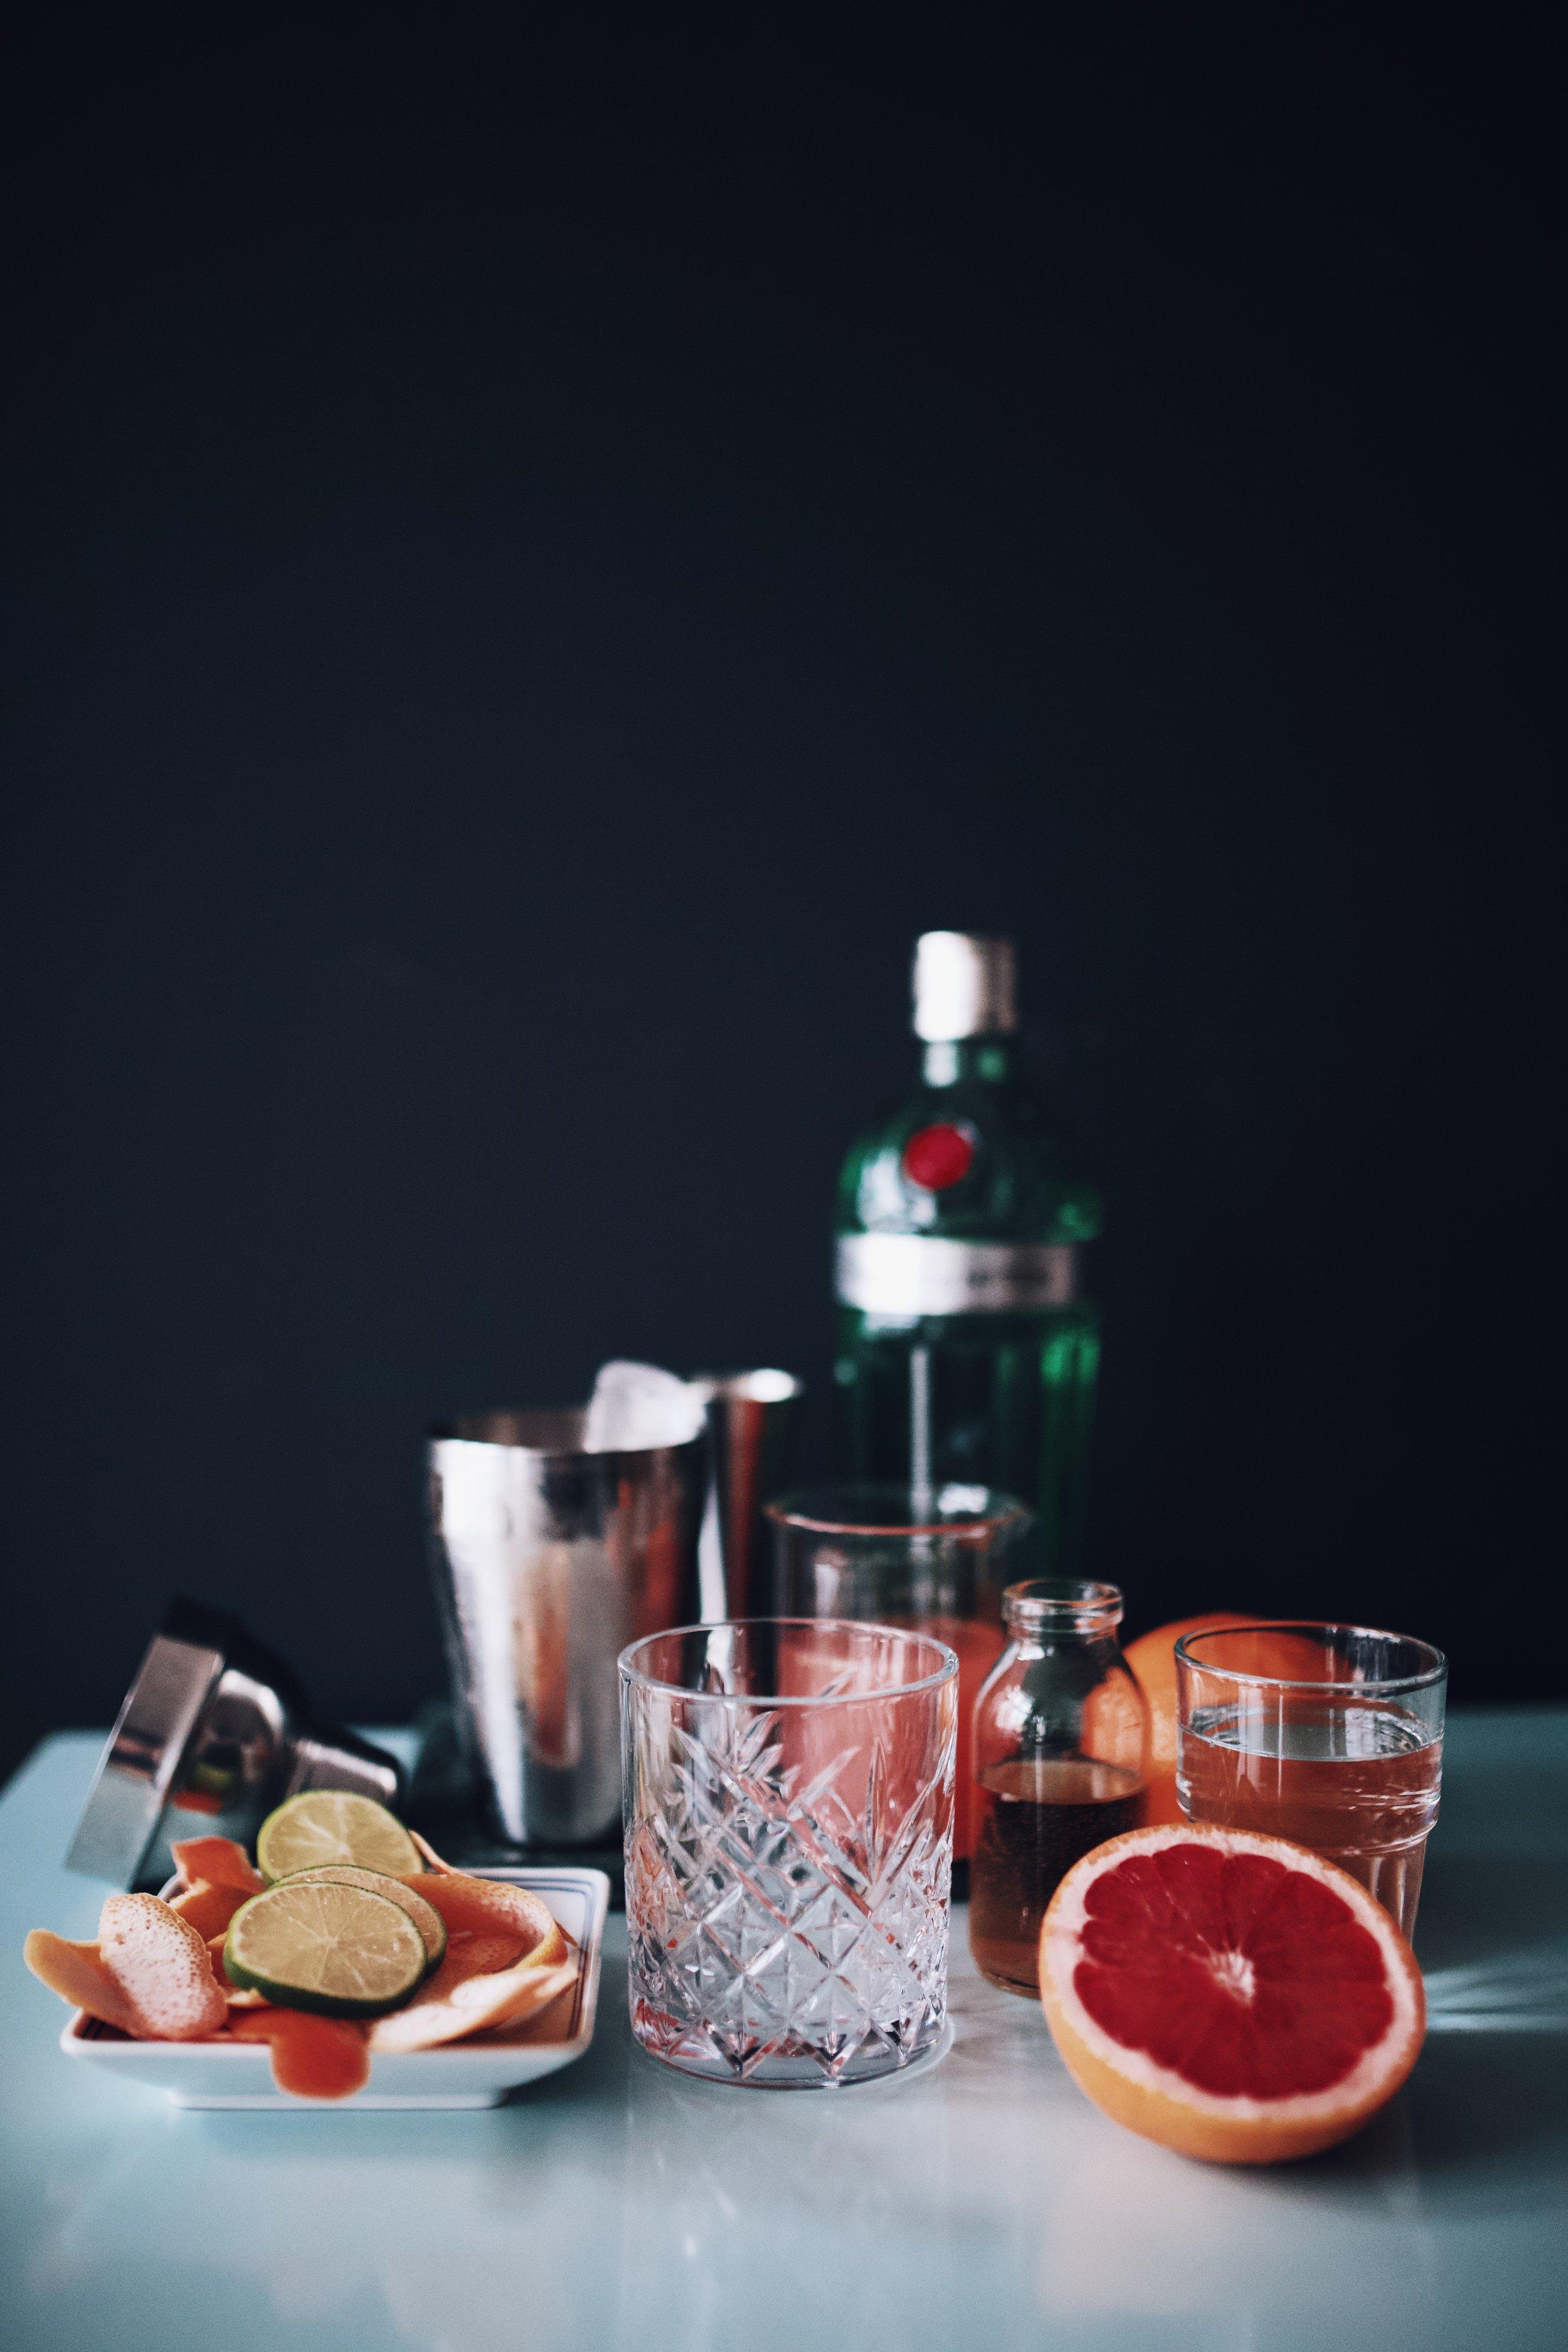 Friday-Drink: PINK SHADDOCK